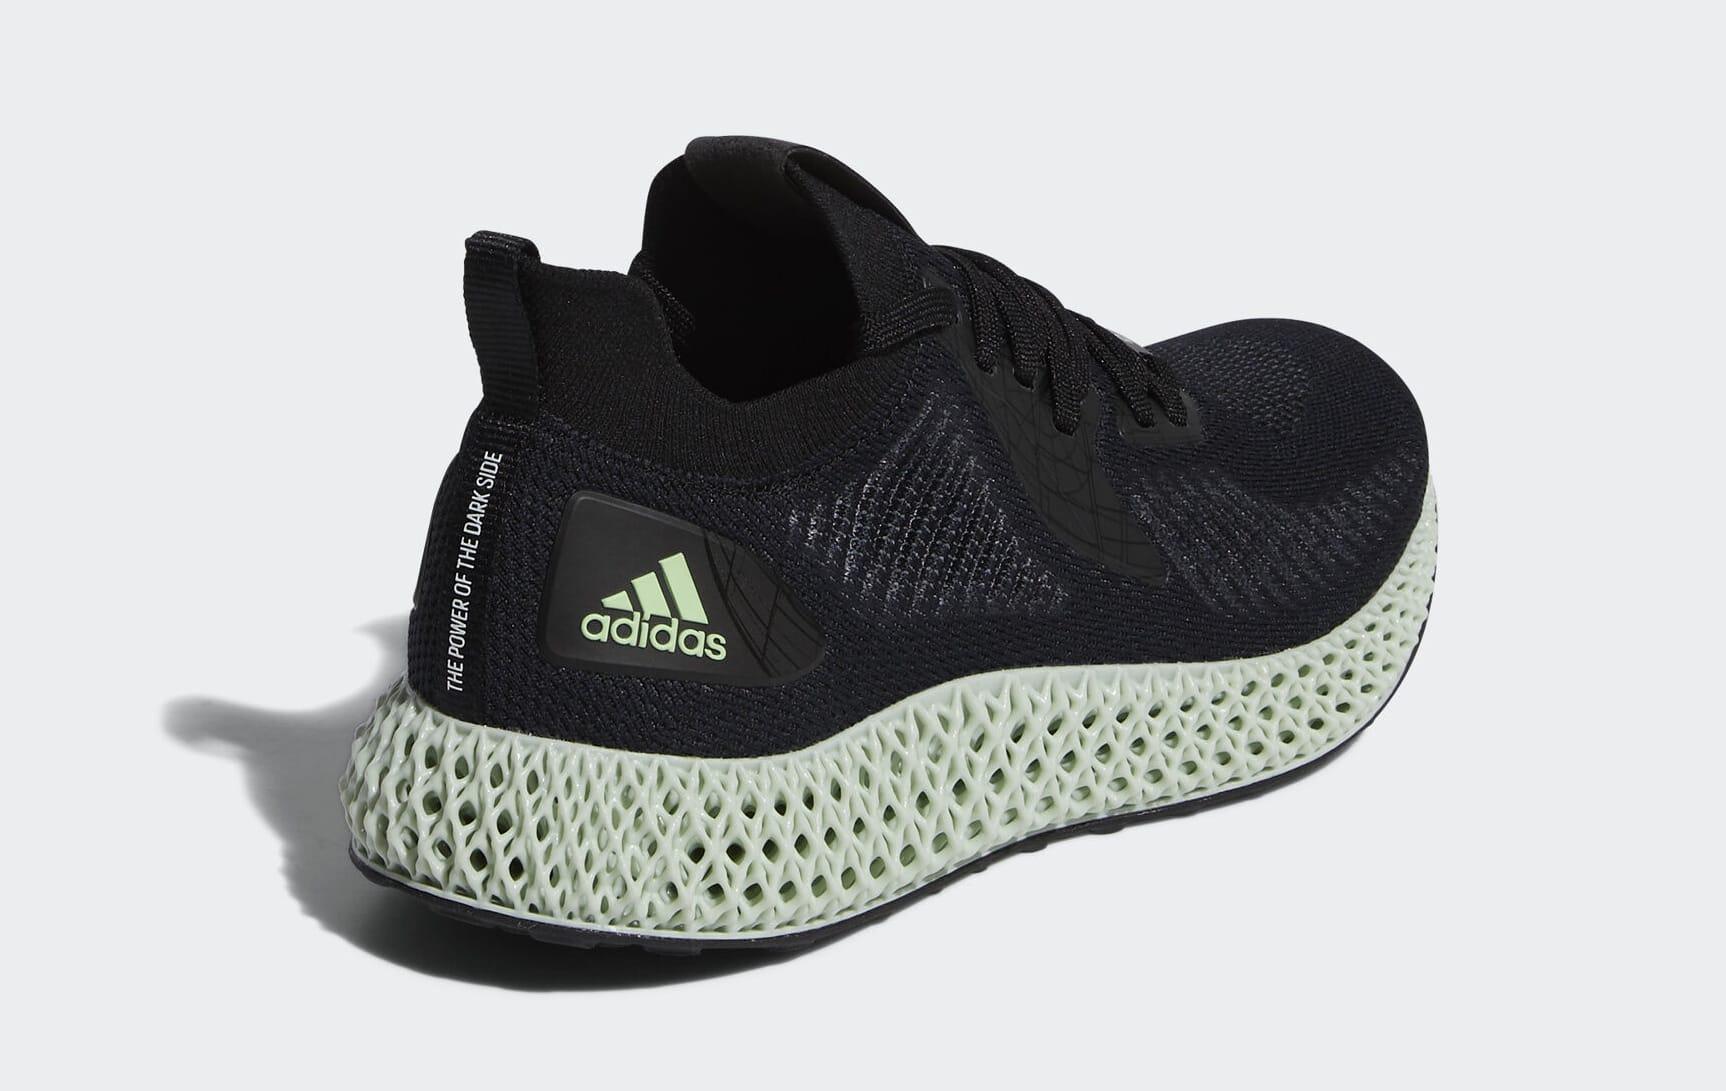 star-wars-adidas-alphaedge-4d-death-star-fv4685-heel